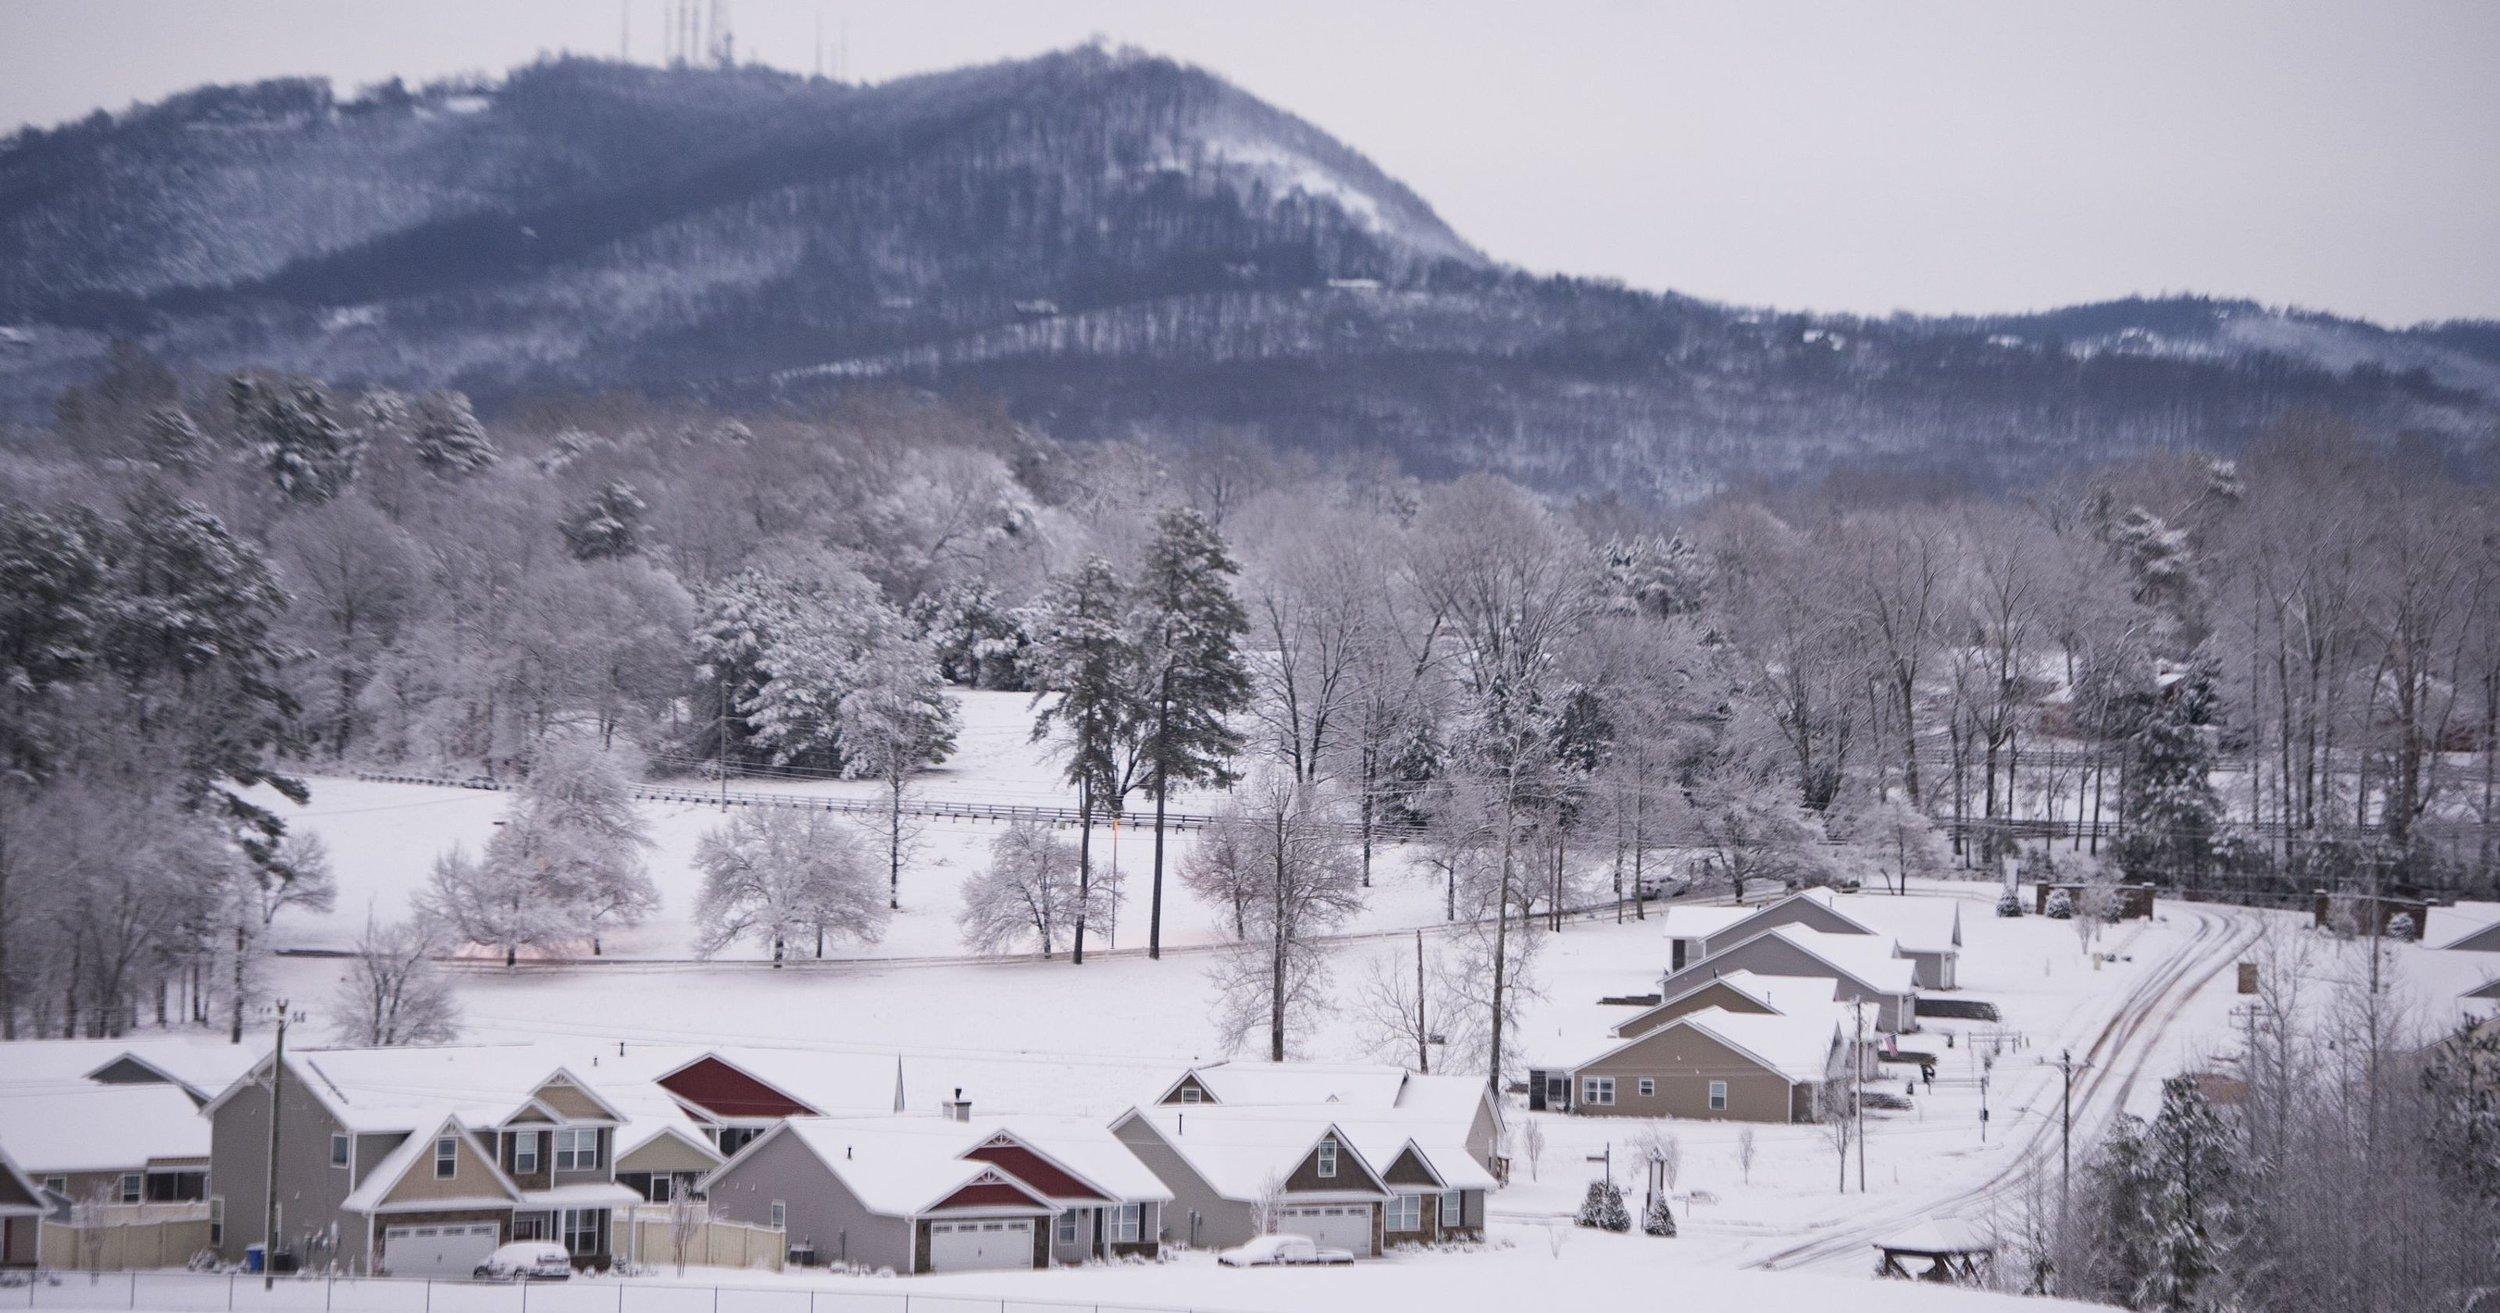 636193736101553266-LP-snow-A-010717.jpg